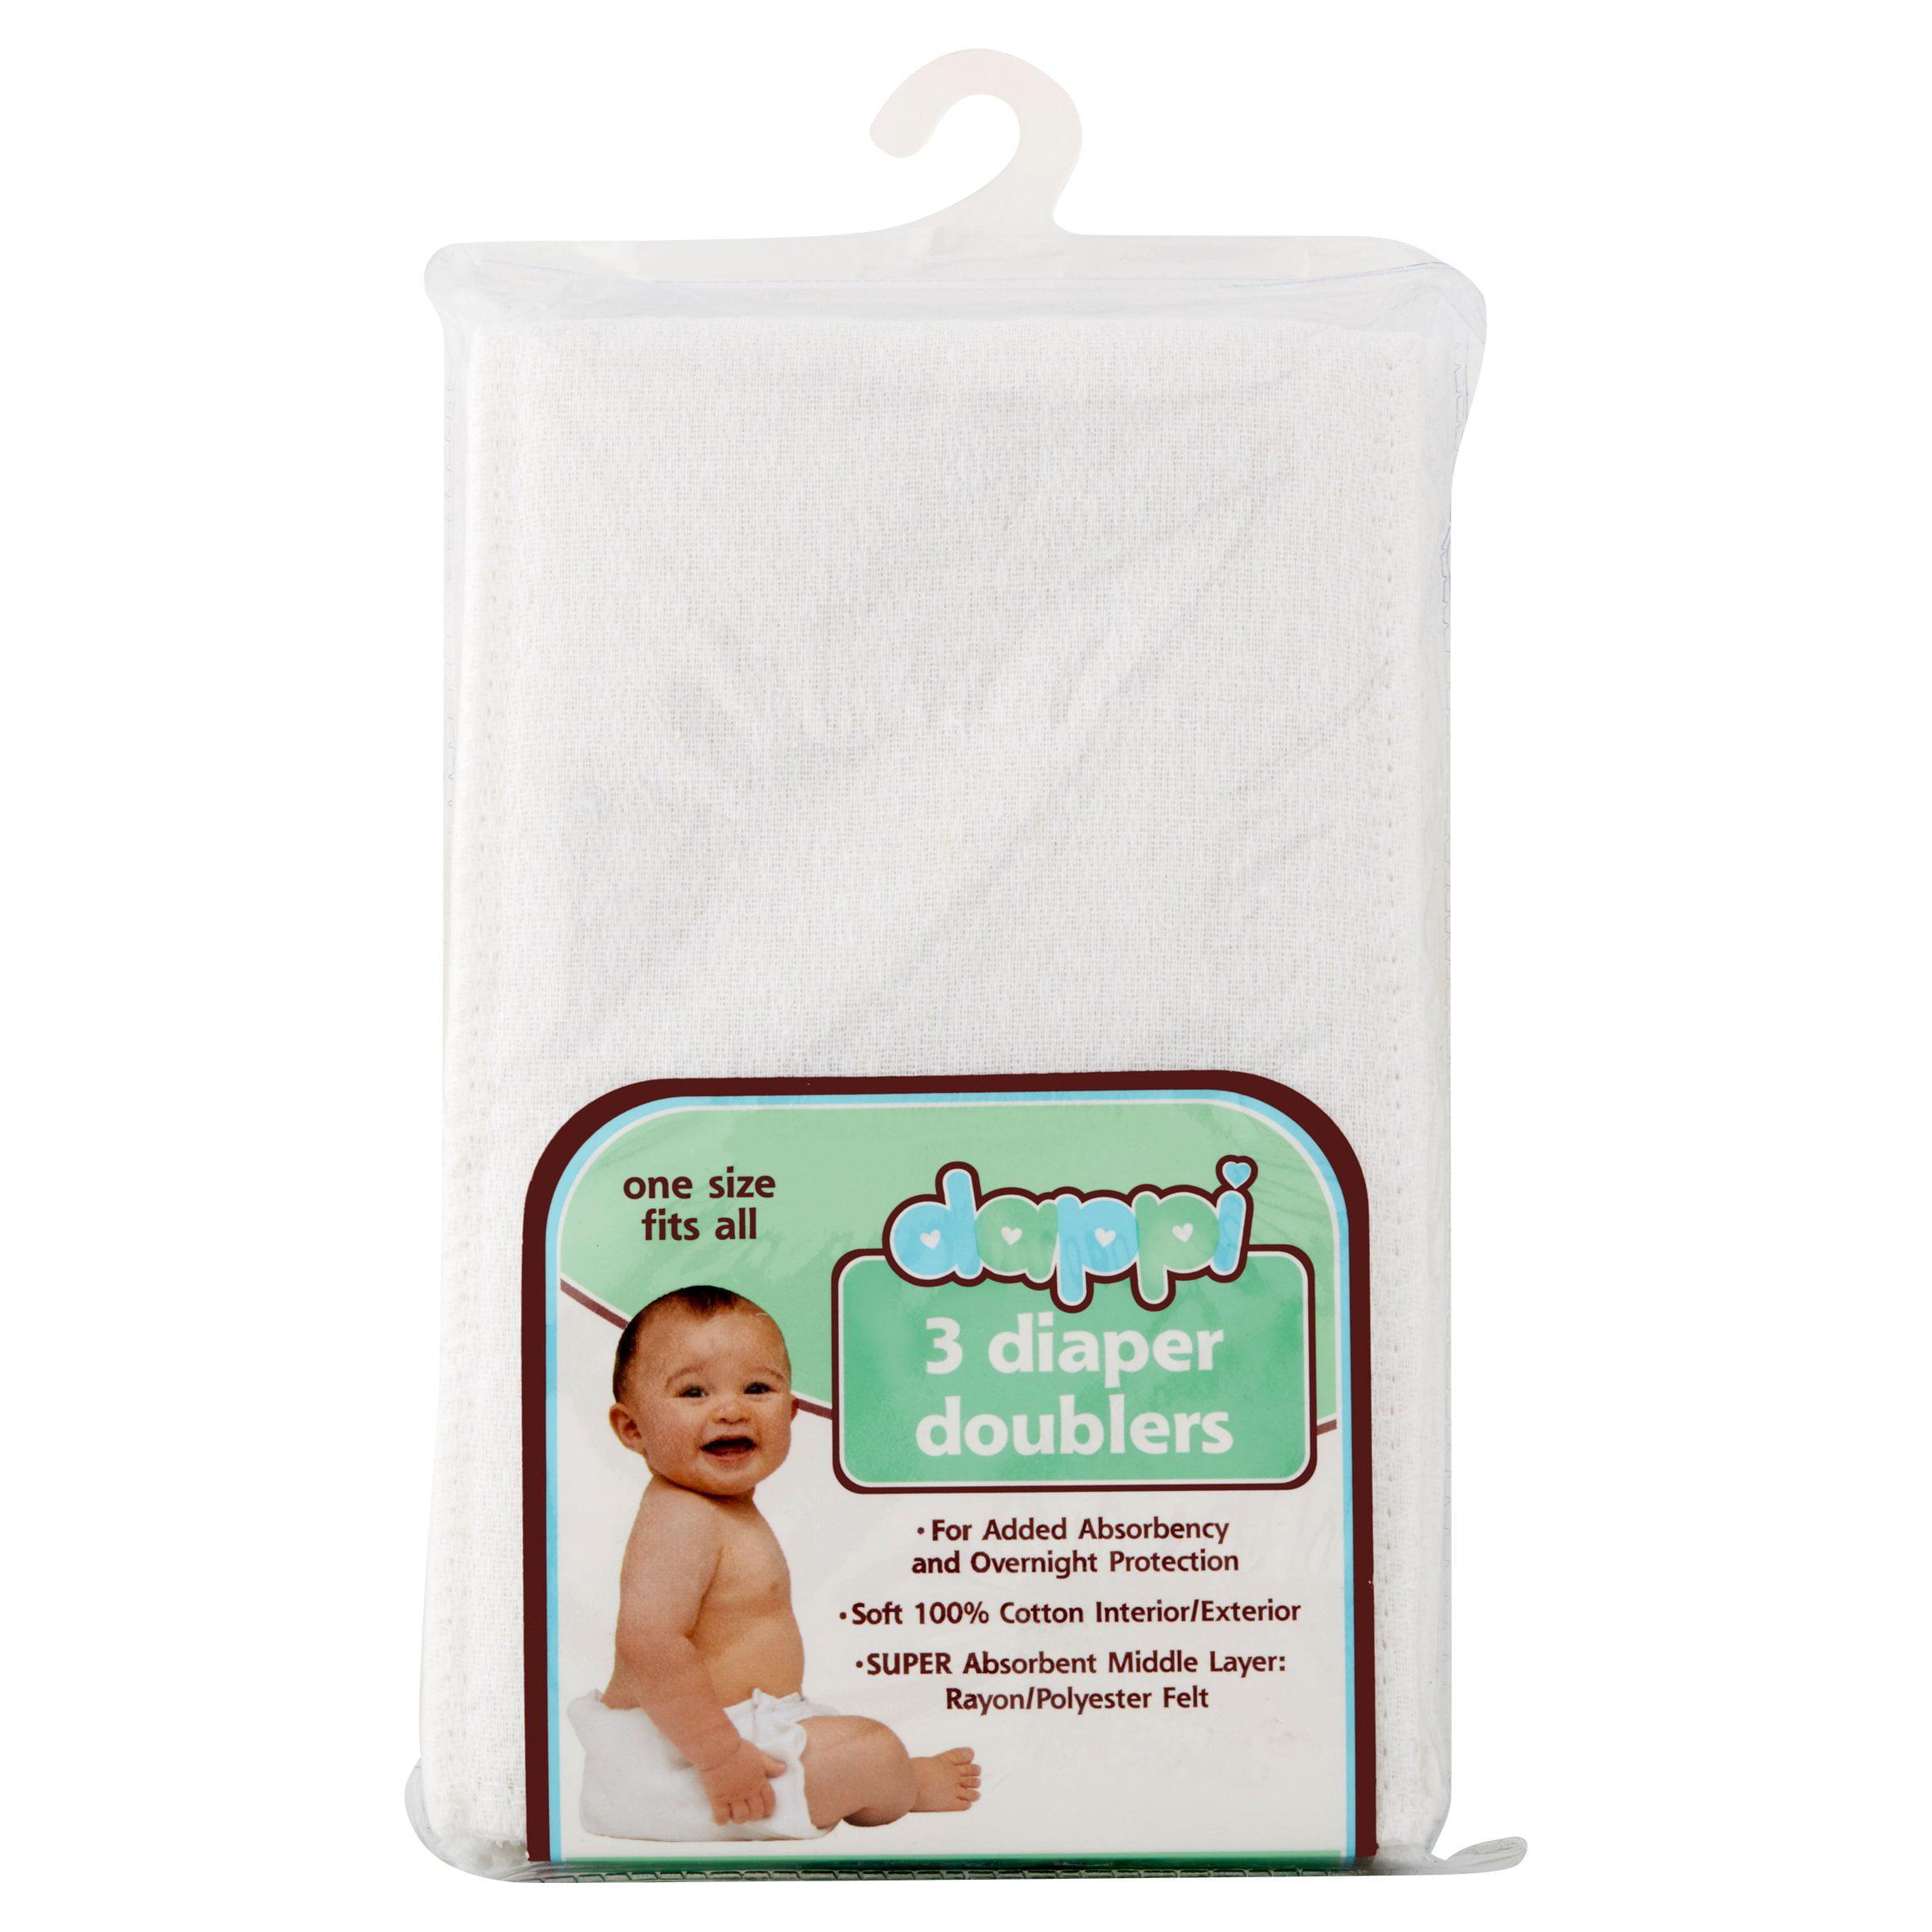 dappi Diaper One Size Fits All, 3.0 CT